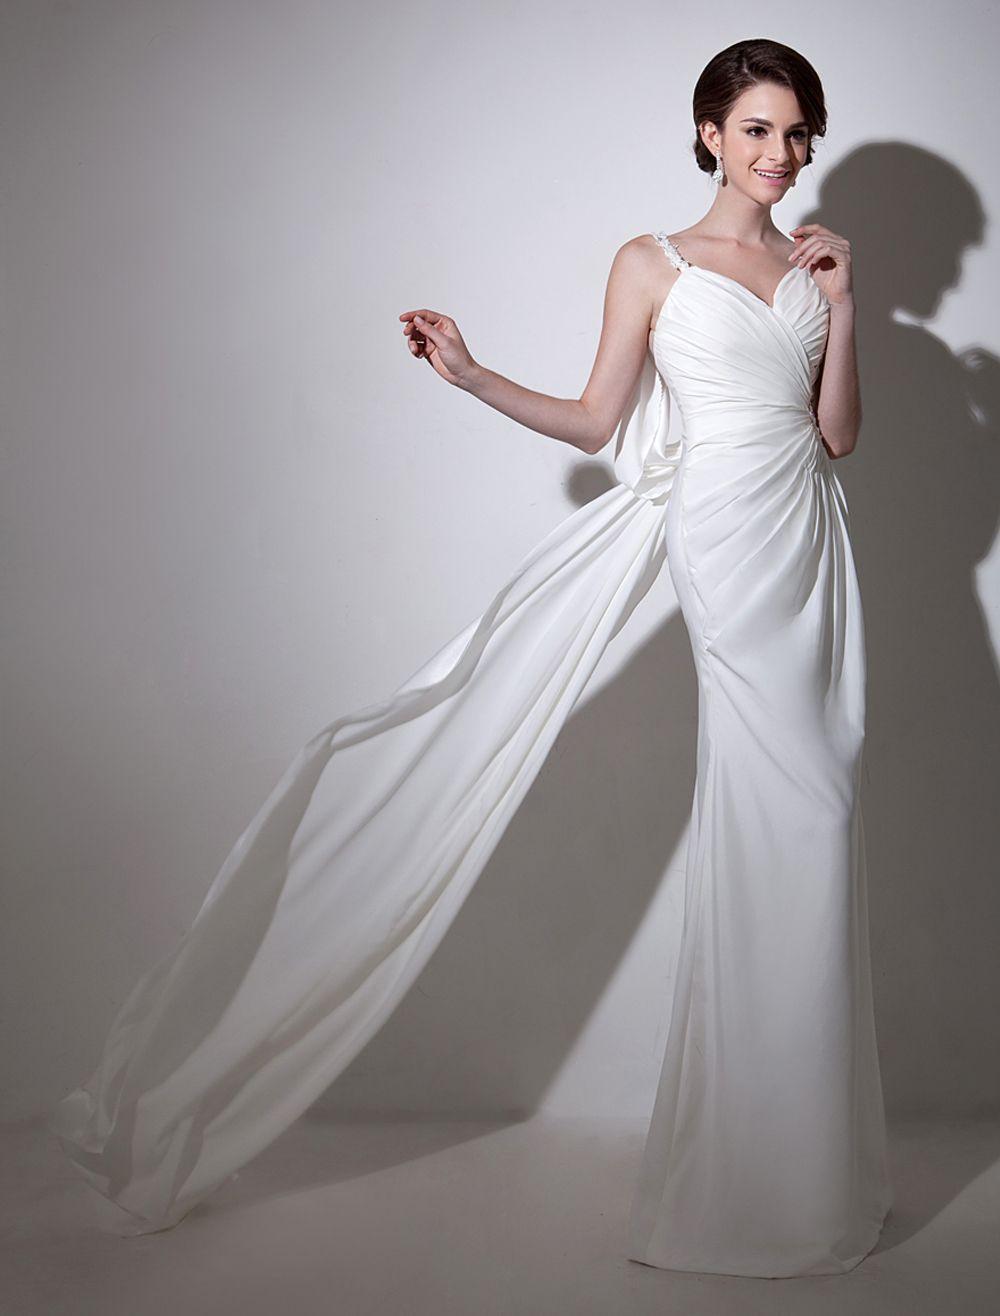 Luxurious White Elastic Silk backless Bridal Wedding Dress with ...